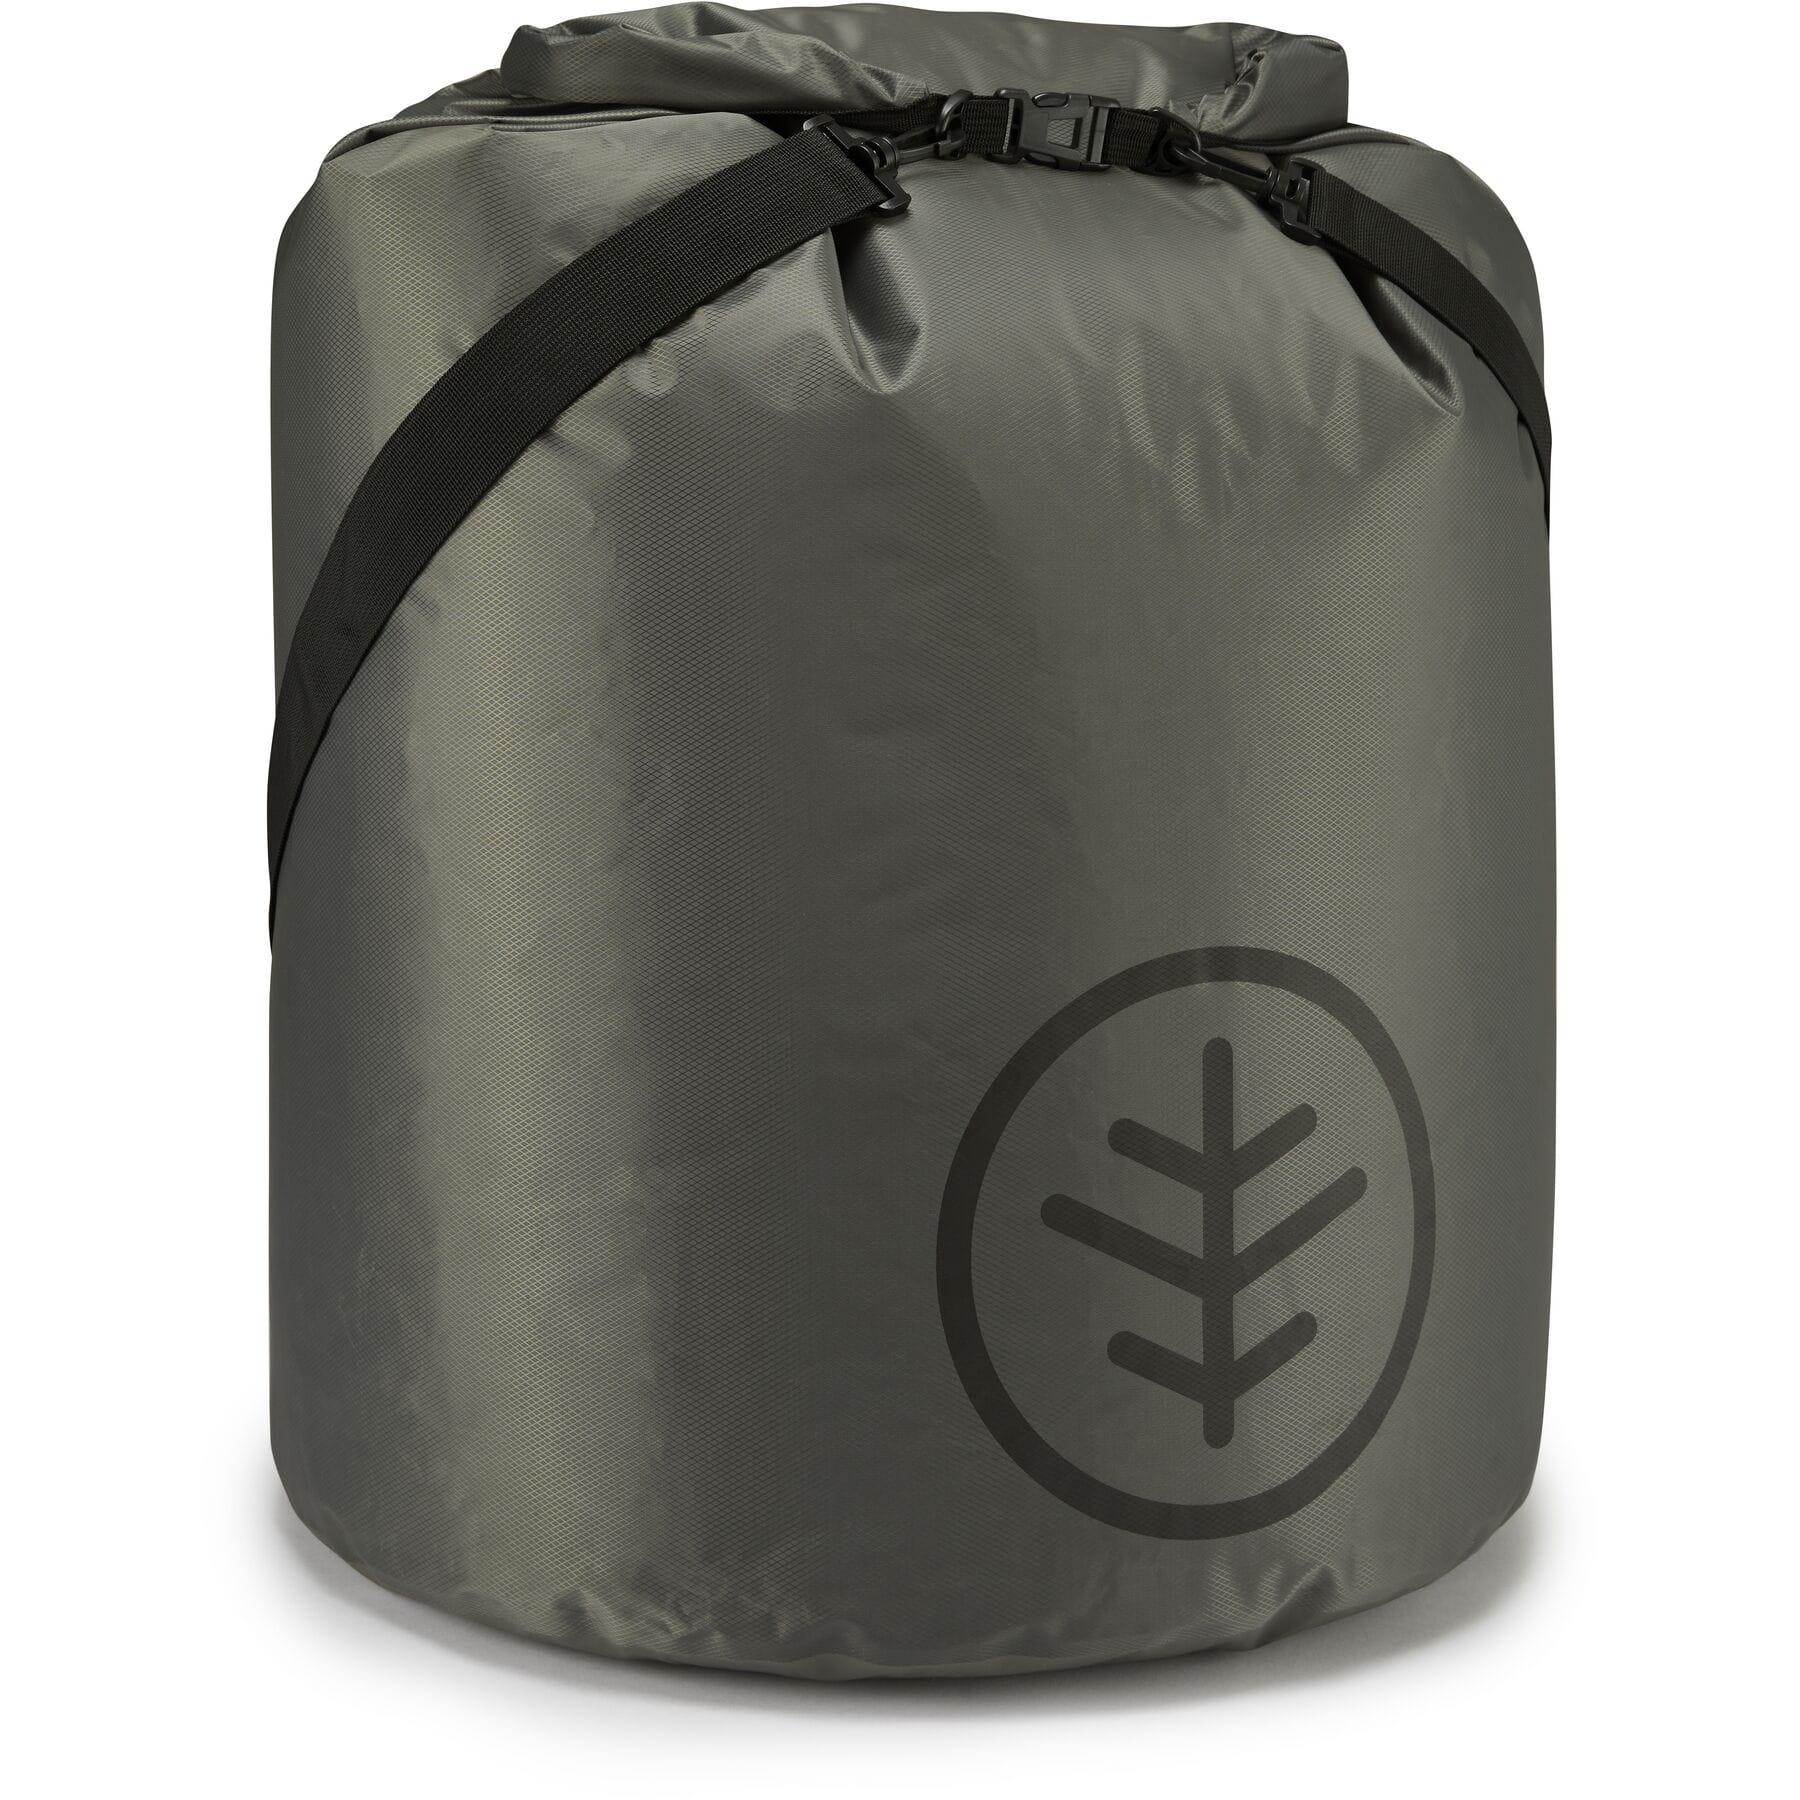 Vak Wychwood Dry Bag 100ltr